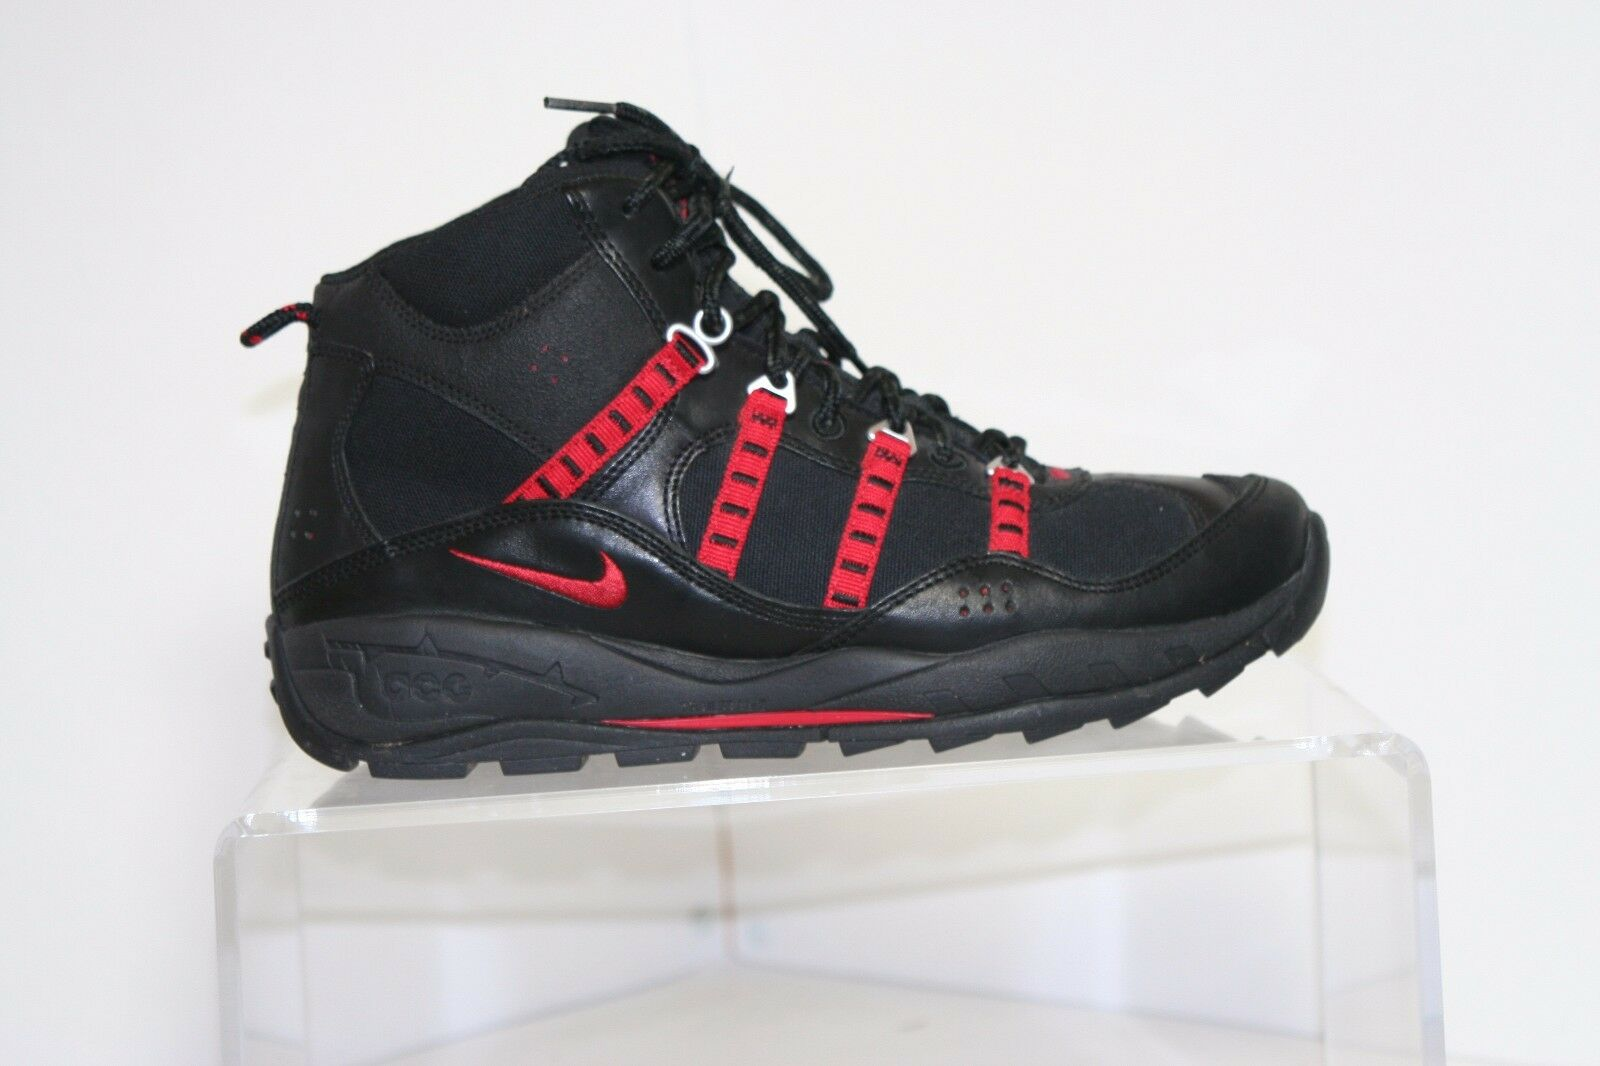 Nike ACG Mada 2k Hiking Trail Boot Sneaker '11 Men 8.5 Multi Black Red Athletic